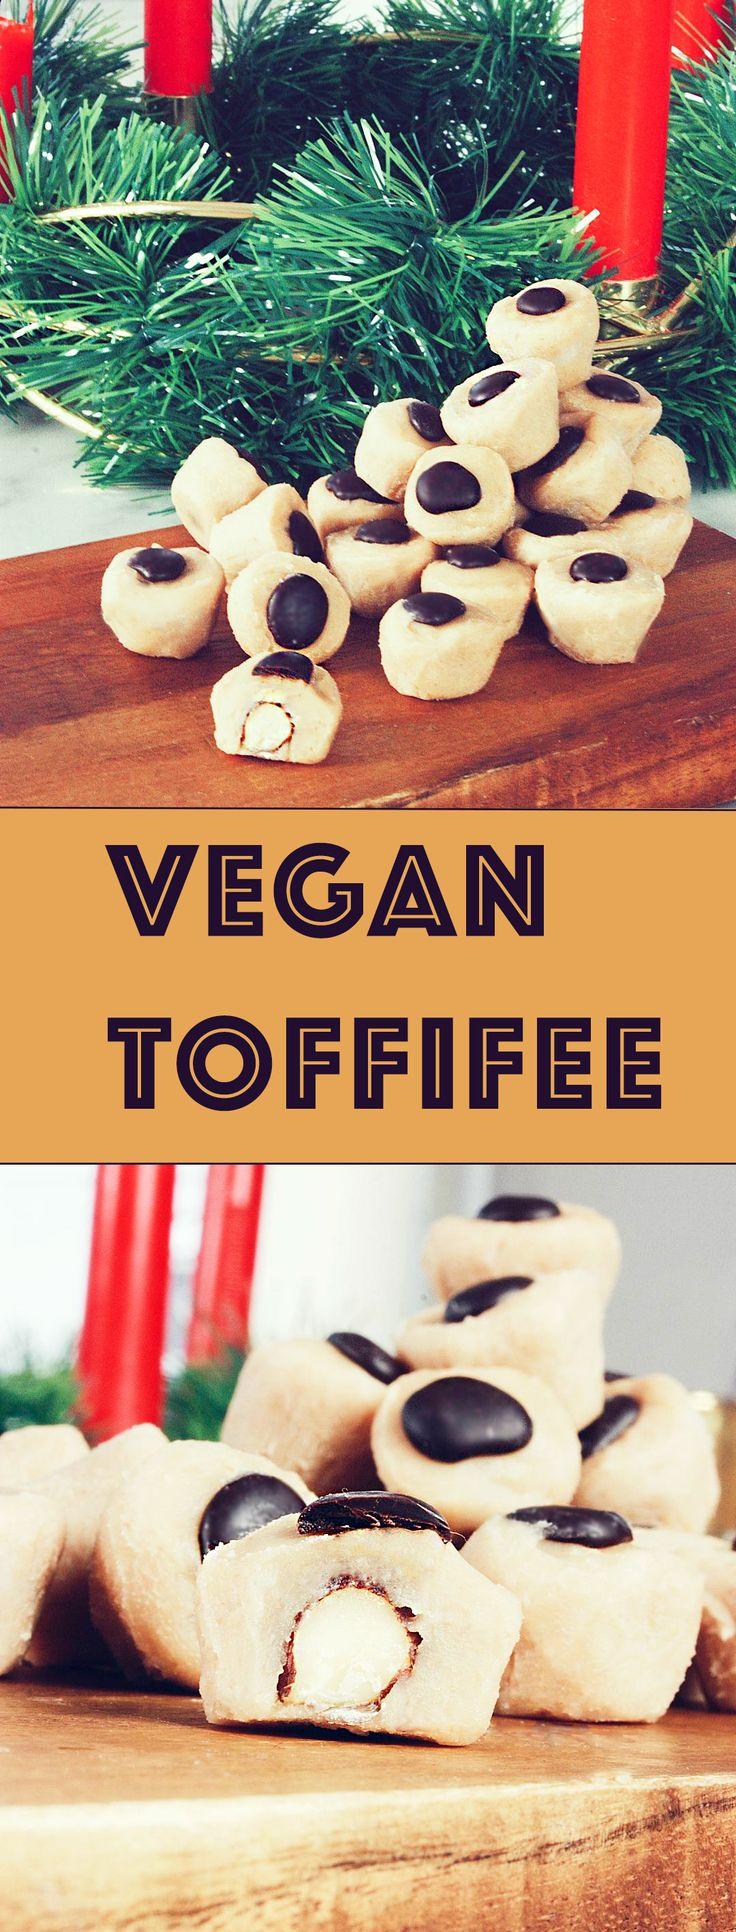 Vegan Toffifee - Gluten free - vegetarian  #recept #julgodis #drömgott #kola #choklad #nötter #hembakat